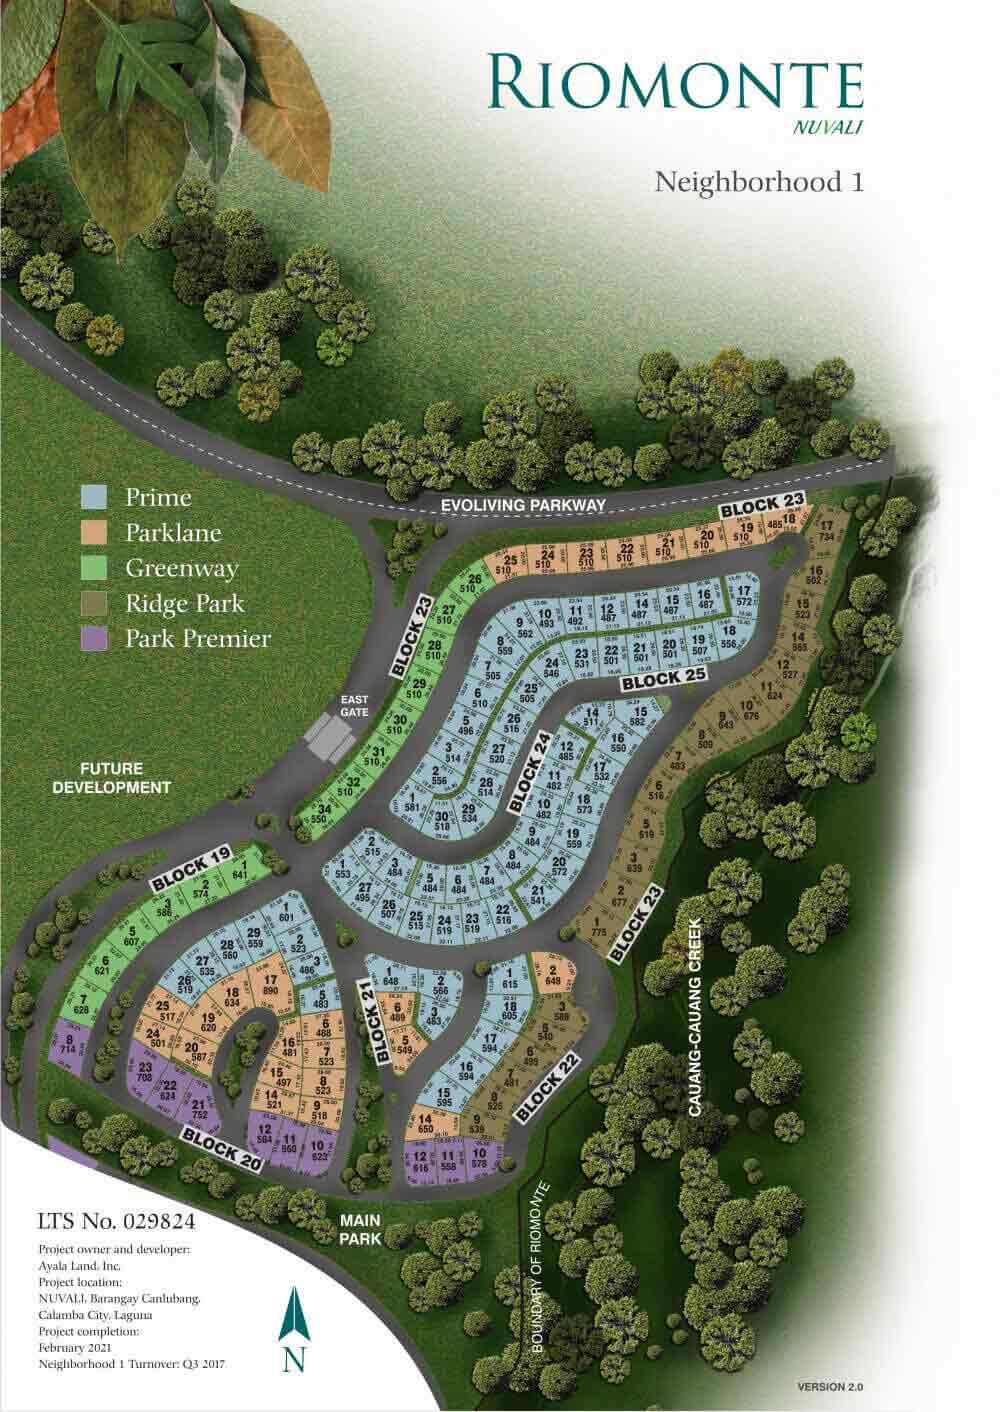 Riomonte - Site Development Plan - Phase 1